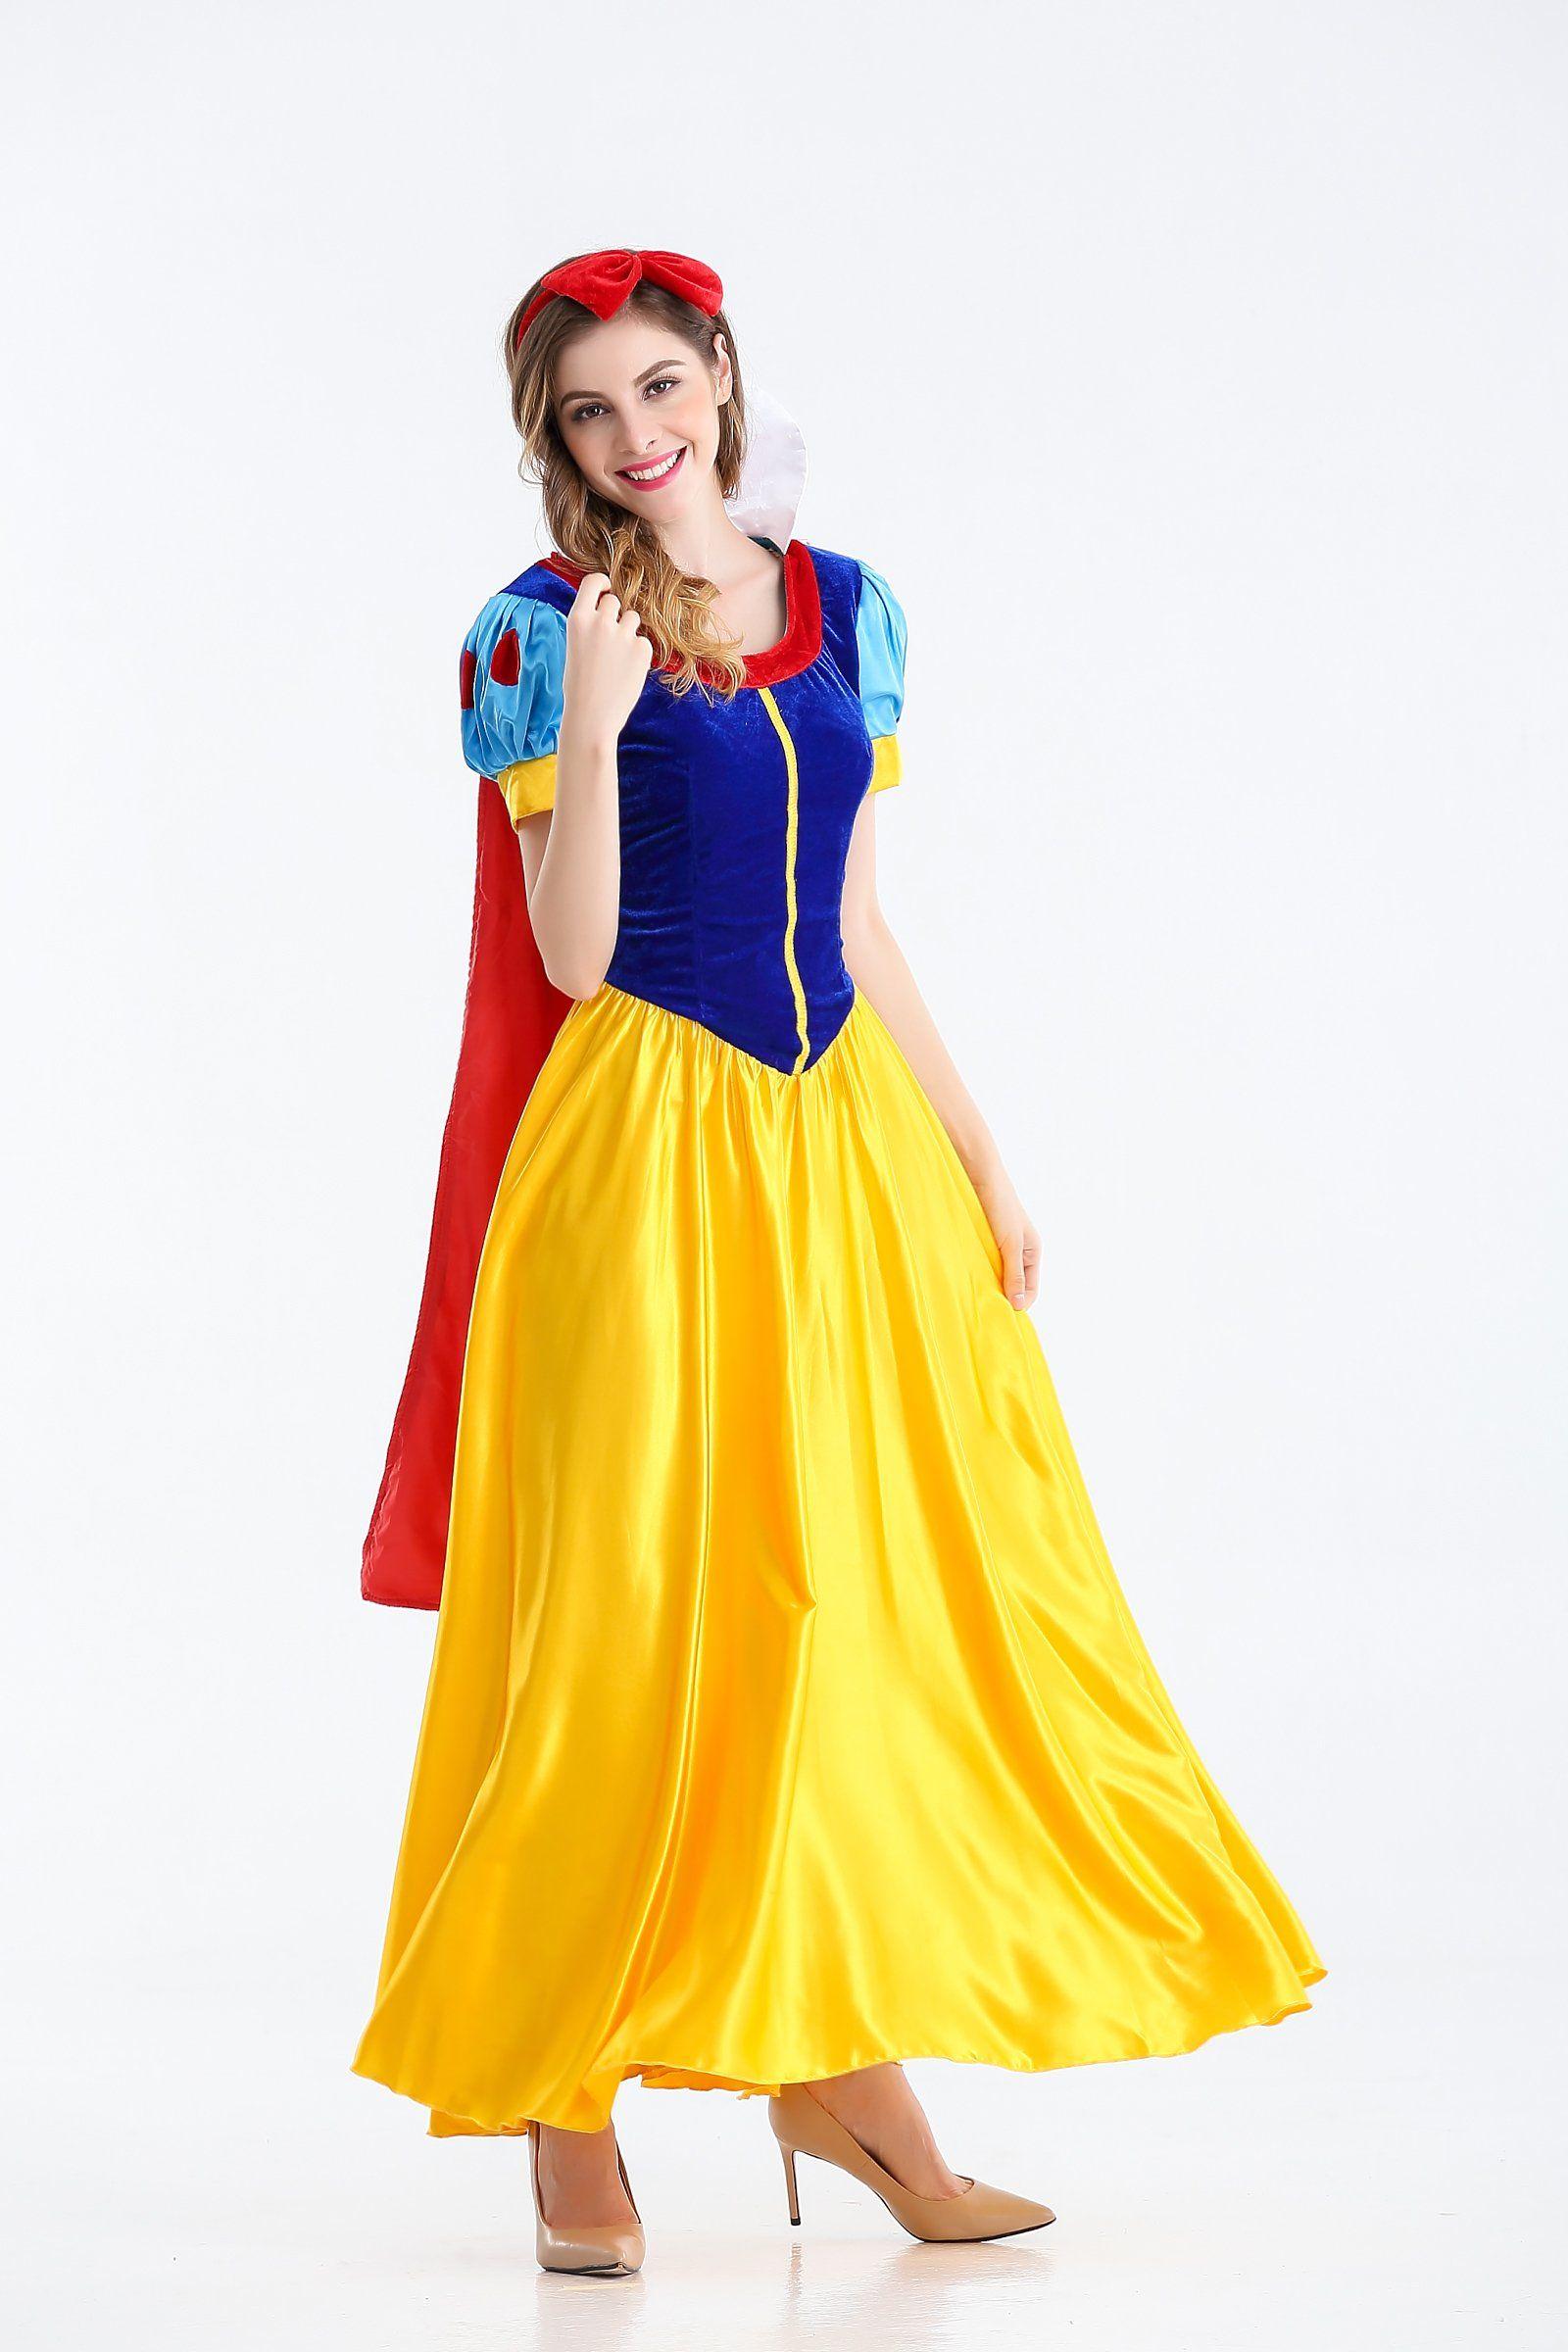 numandliky Ladies Snow White Princess Fairytale Film